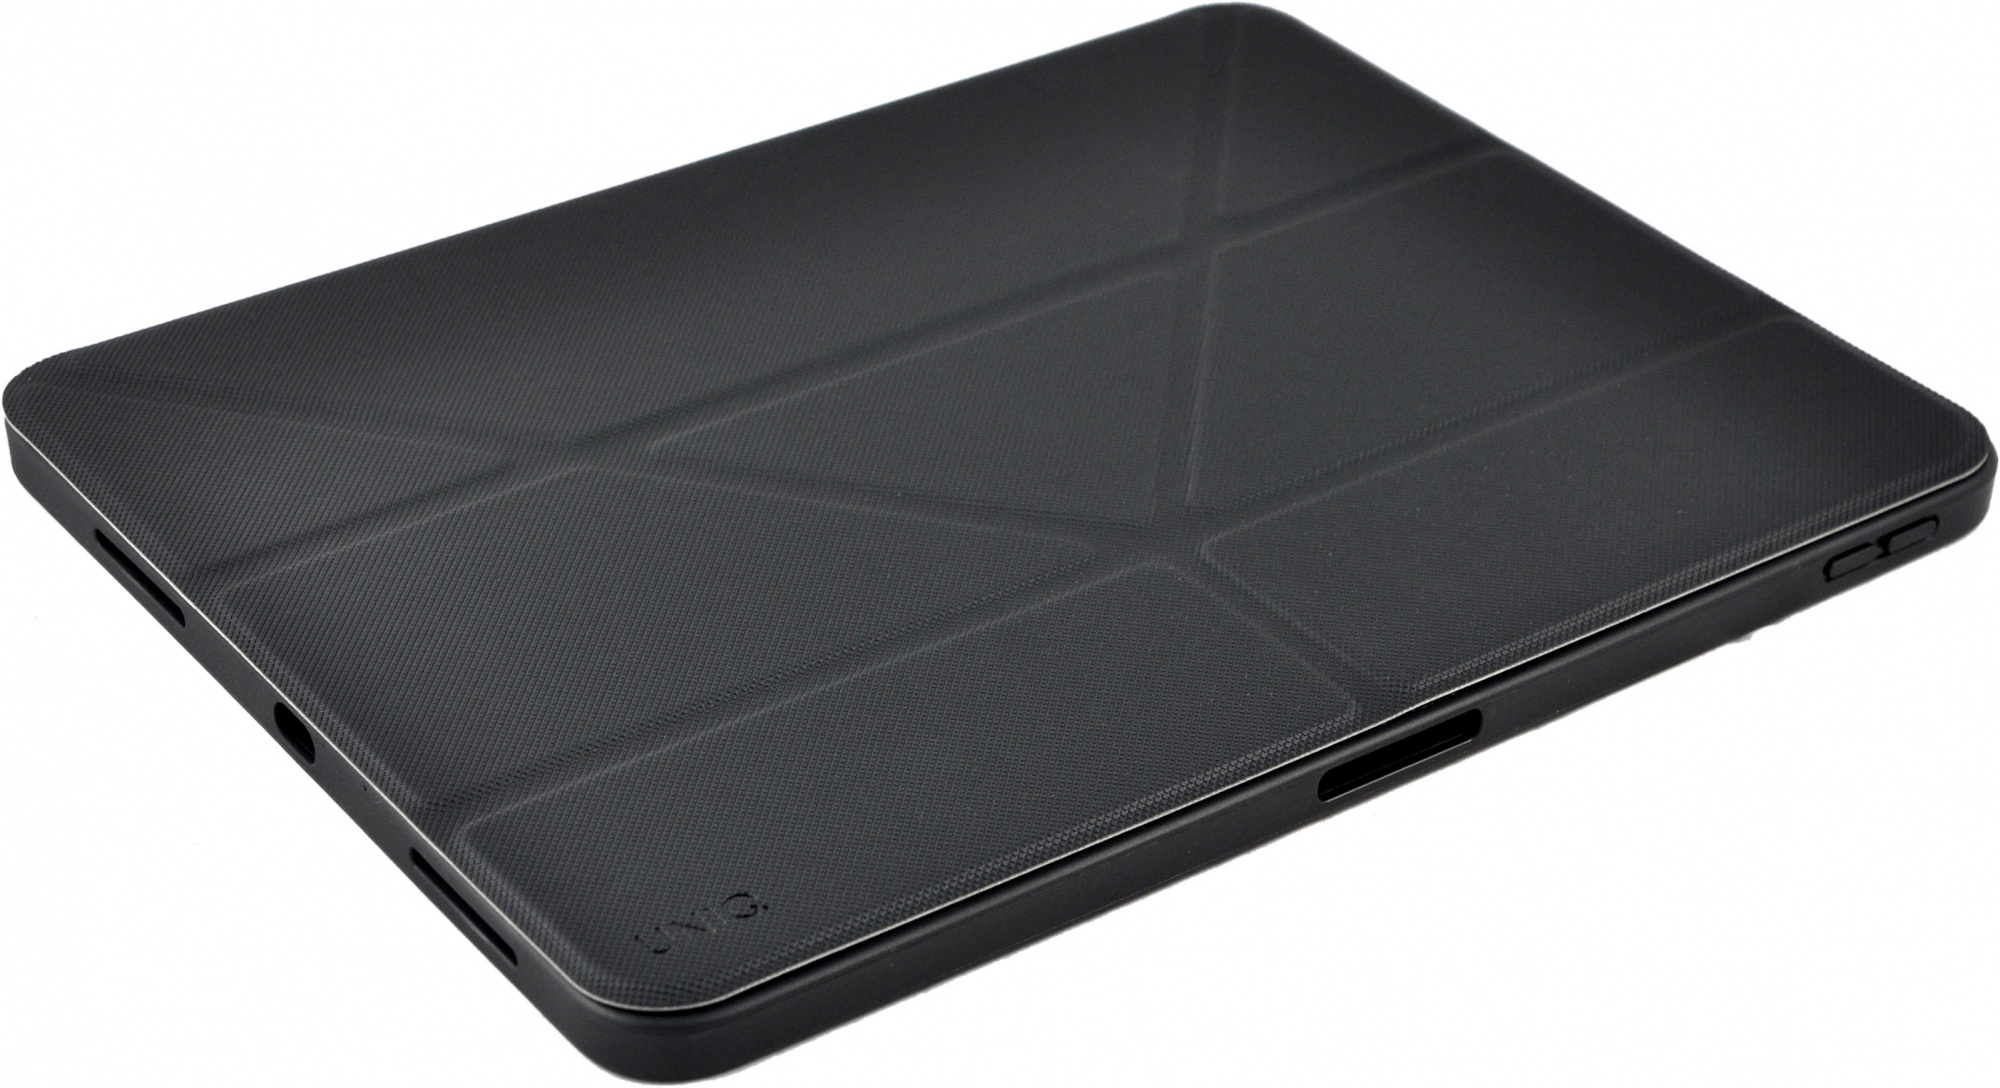 "Чехол Uniq Transforma Rigor для iPad Pro 12.9"" 2018 (Black)"